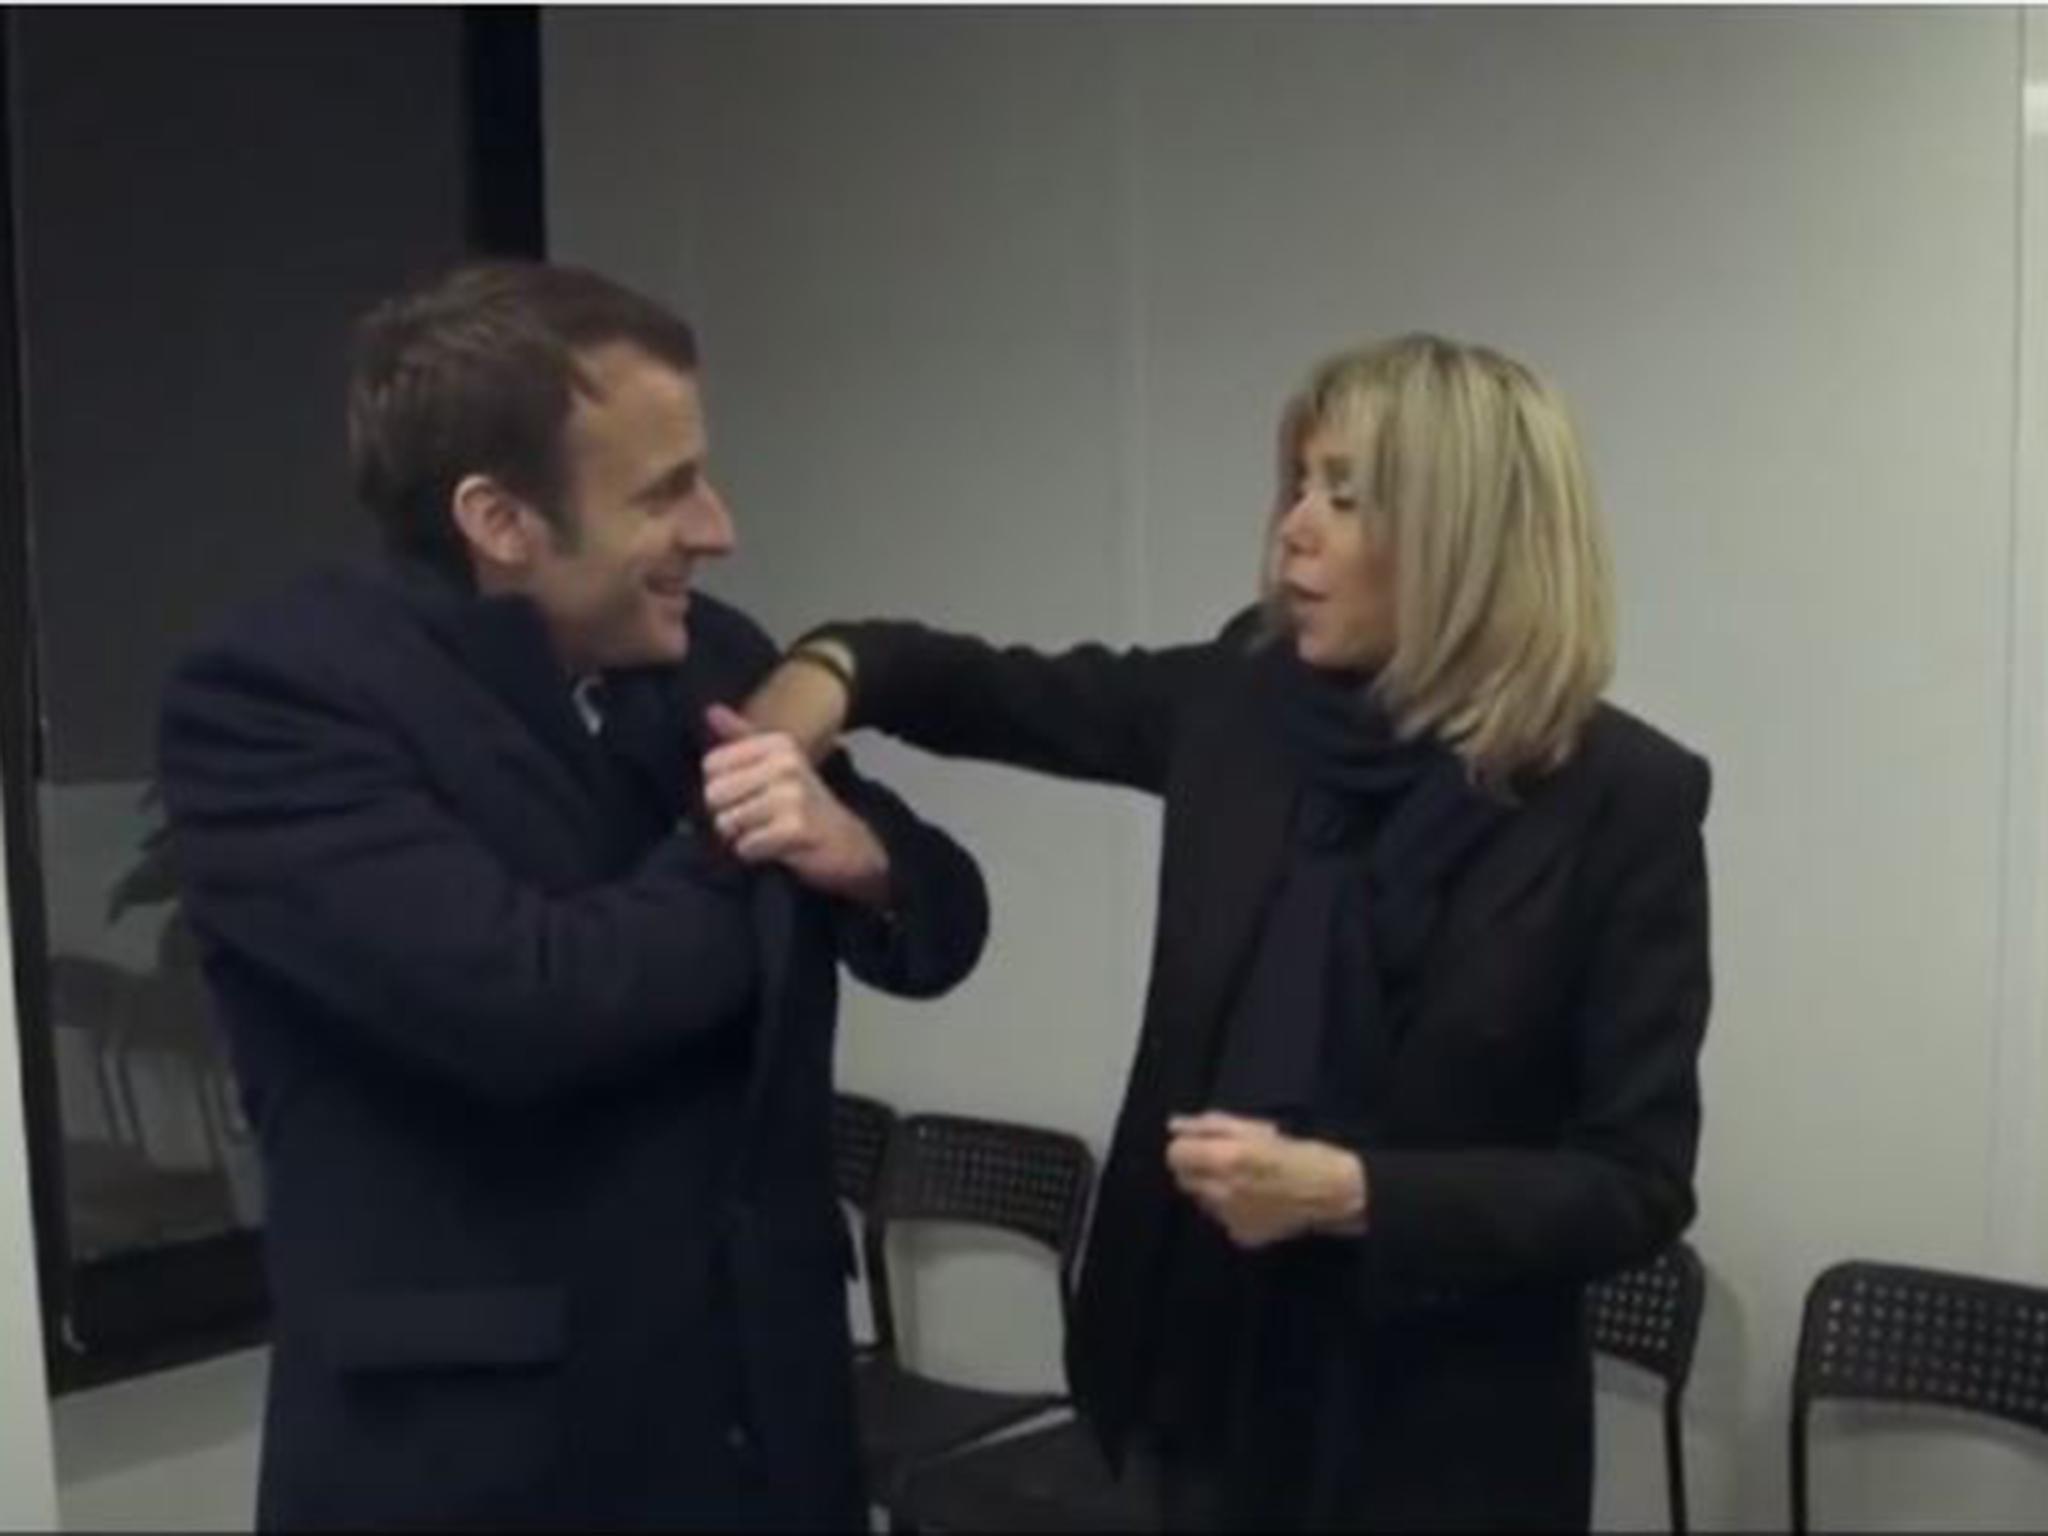 French election: Emmanuel Macron's wife Brigitte kept him ...